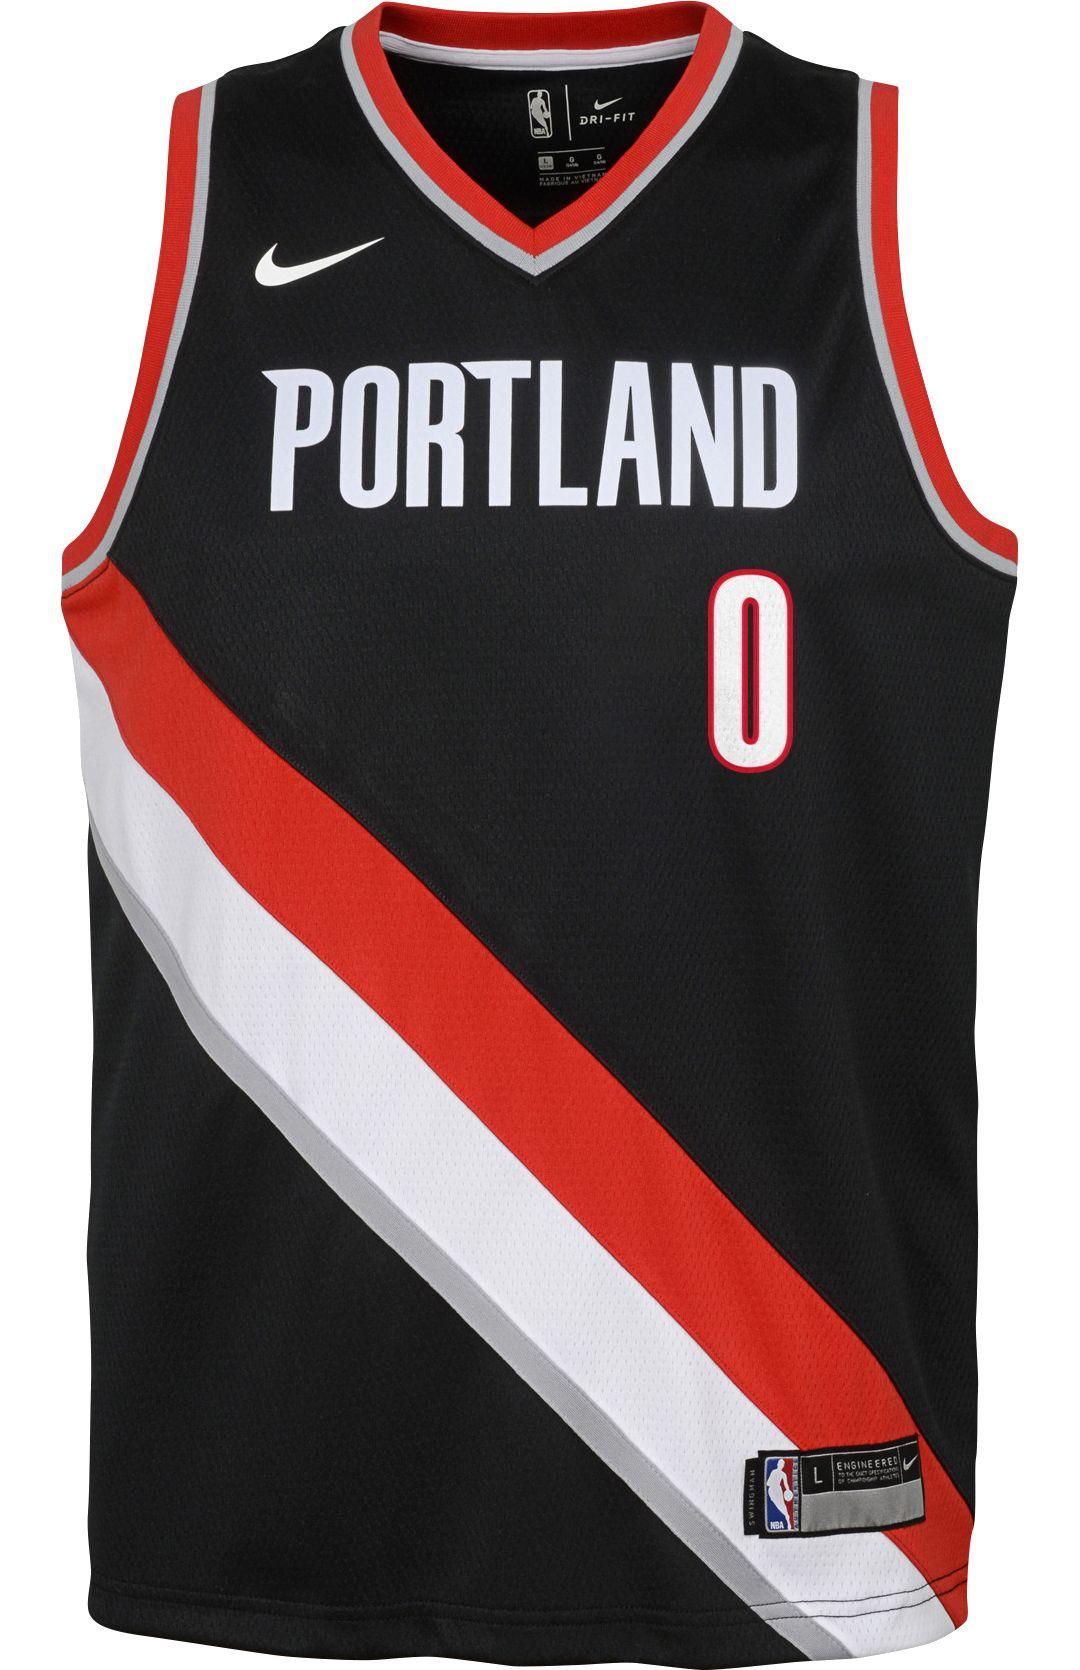 meet 6e54f fd435 Nike Youth Portland Trail Blazers Damian Lillard #0 Black Dri-FIT Swingman  Jersey